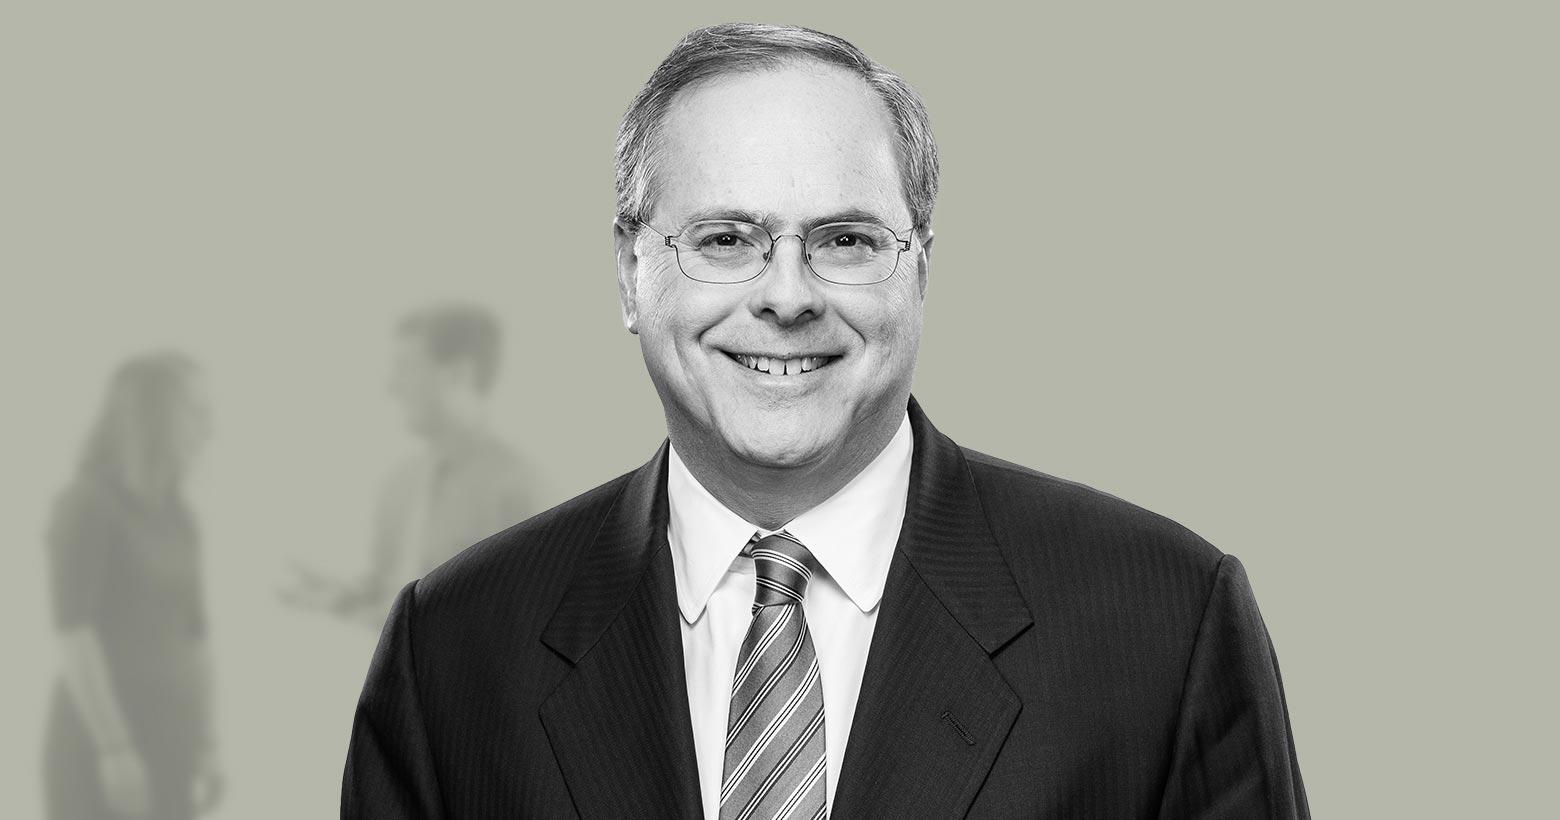 Alan M. Klein